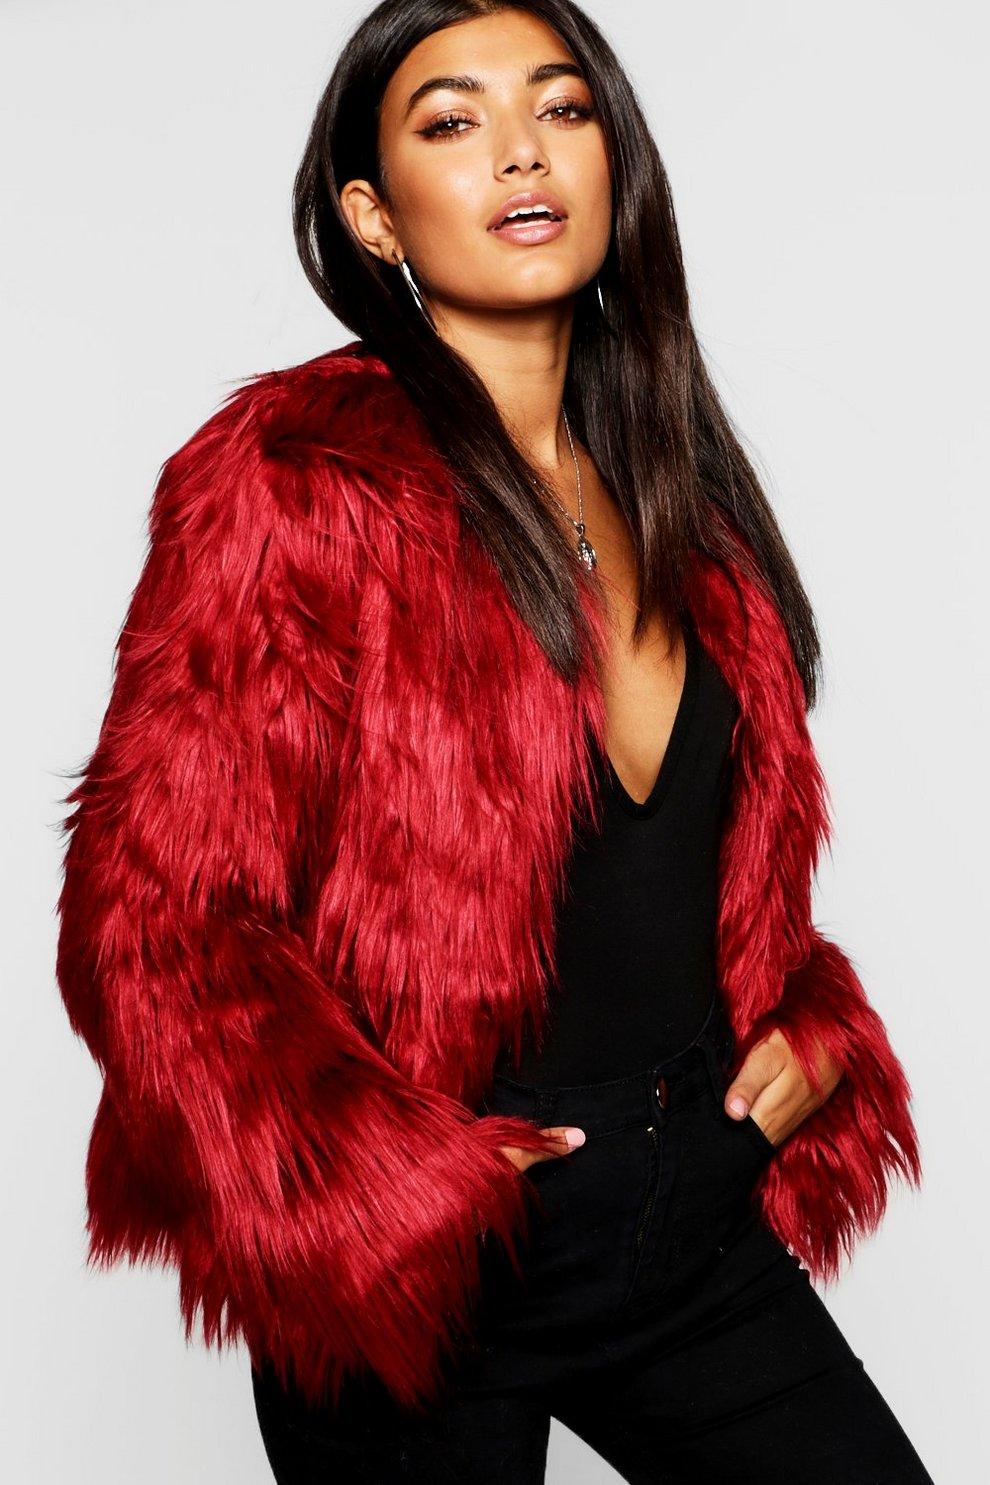 75751c47a8c Womens Burgundy Shaggy Faux Fur Coat